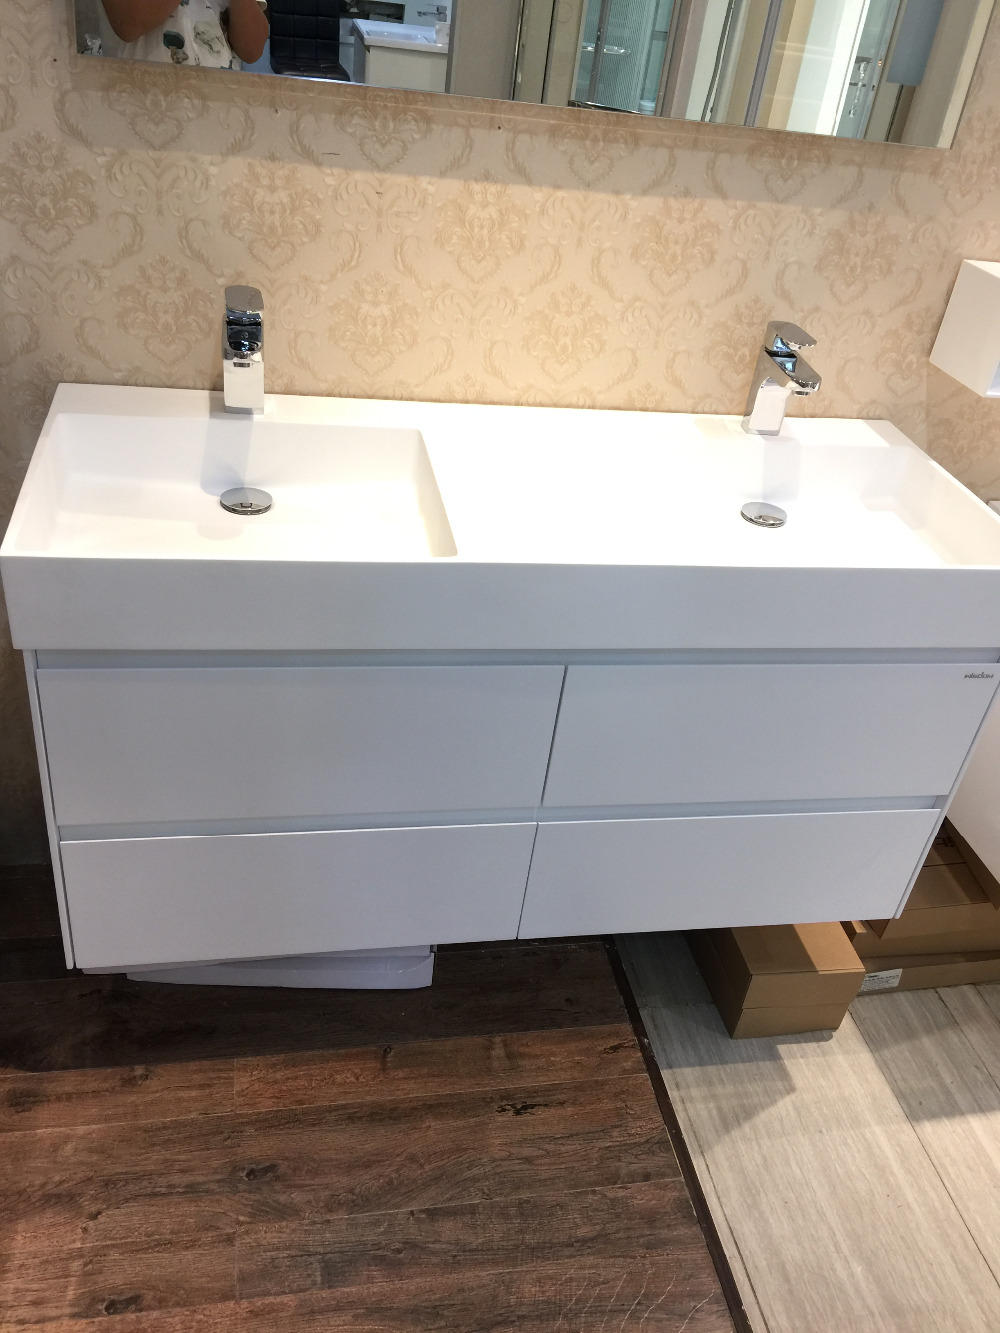 Bathroom sink stone - 1200mm Wall Mounted Solid Surface Stone Double Basin With Soild Wooden Bathroom Vanity Cloakroom Cabinet Oka